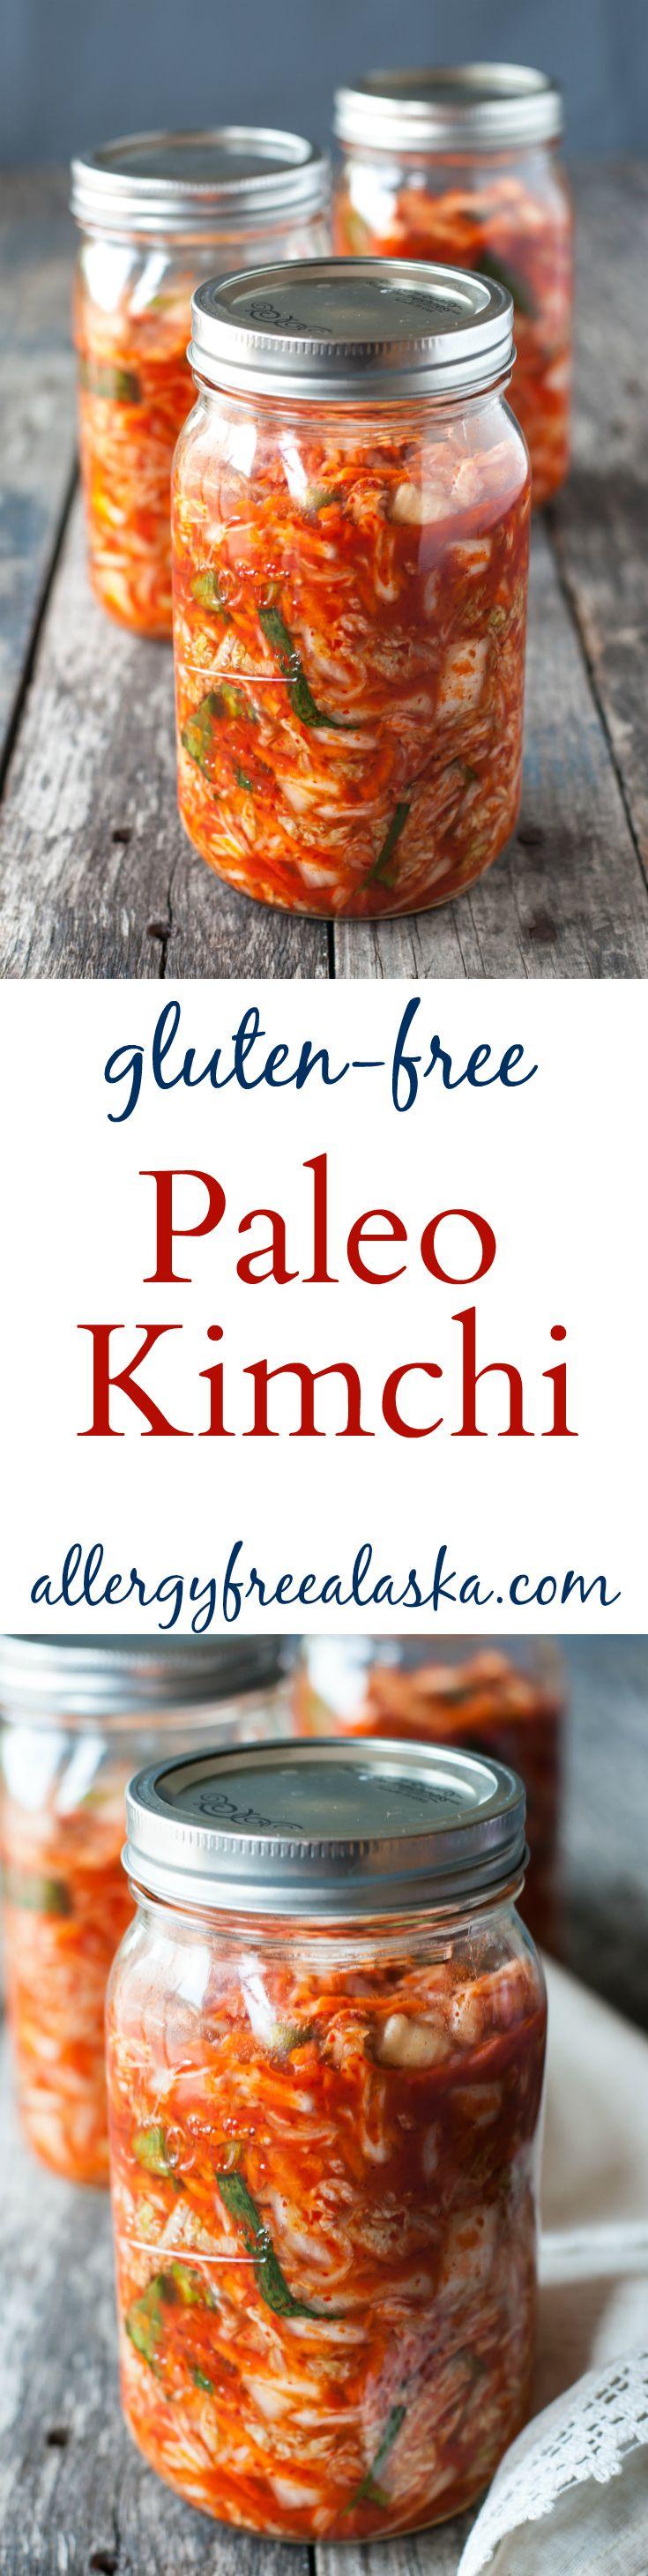 932 best korean food images on pinterest cooking food korean food paleo kimchi recipe from allergy free alaska forumfinder Image collections